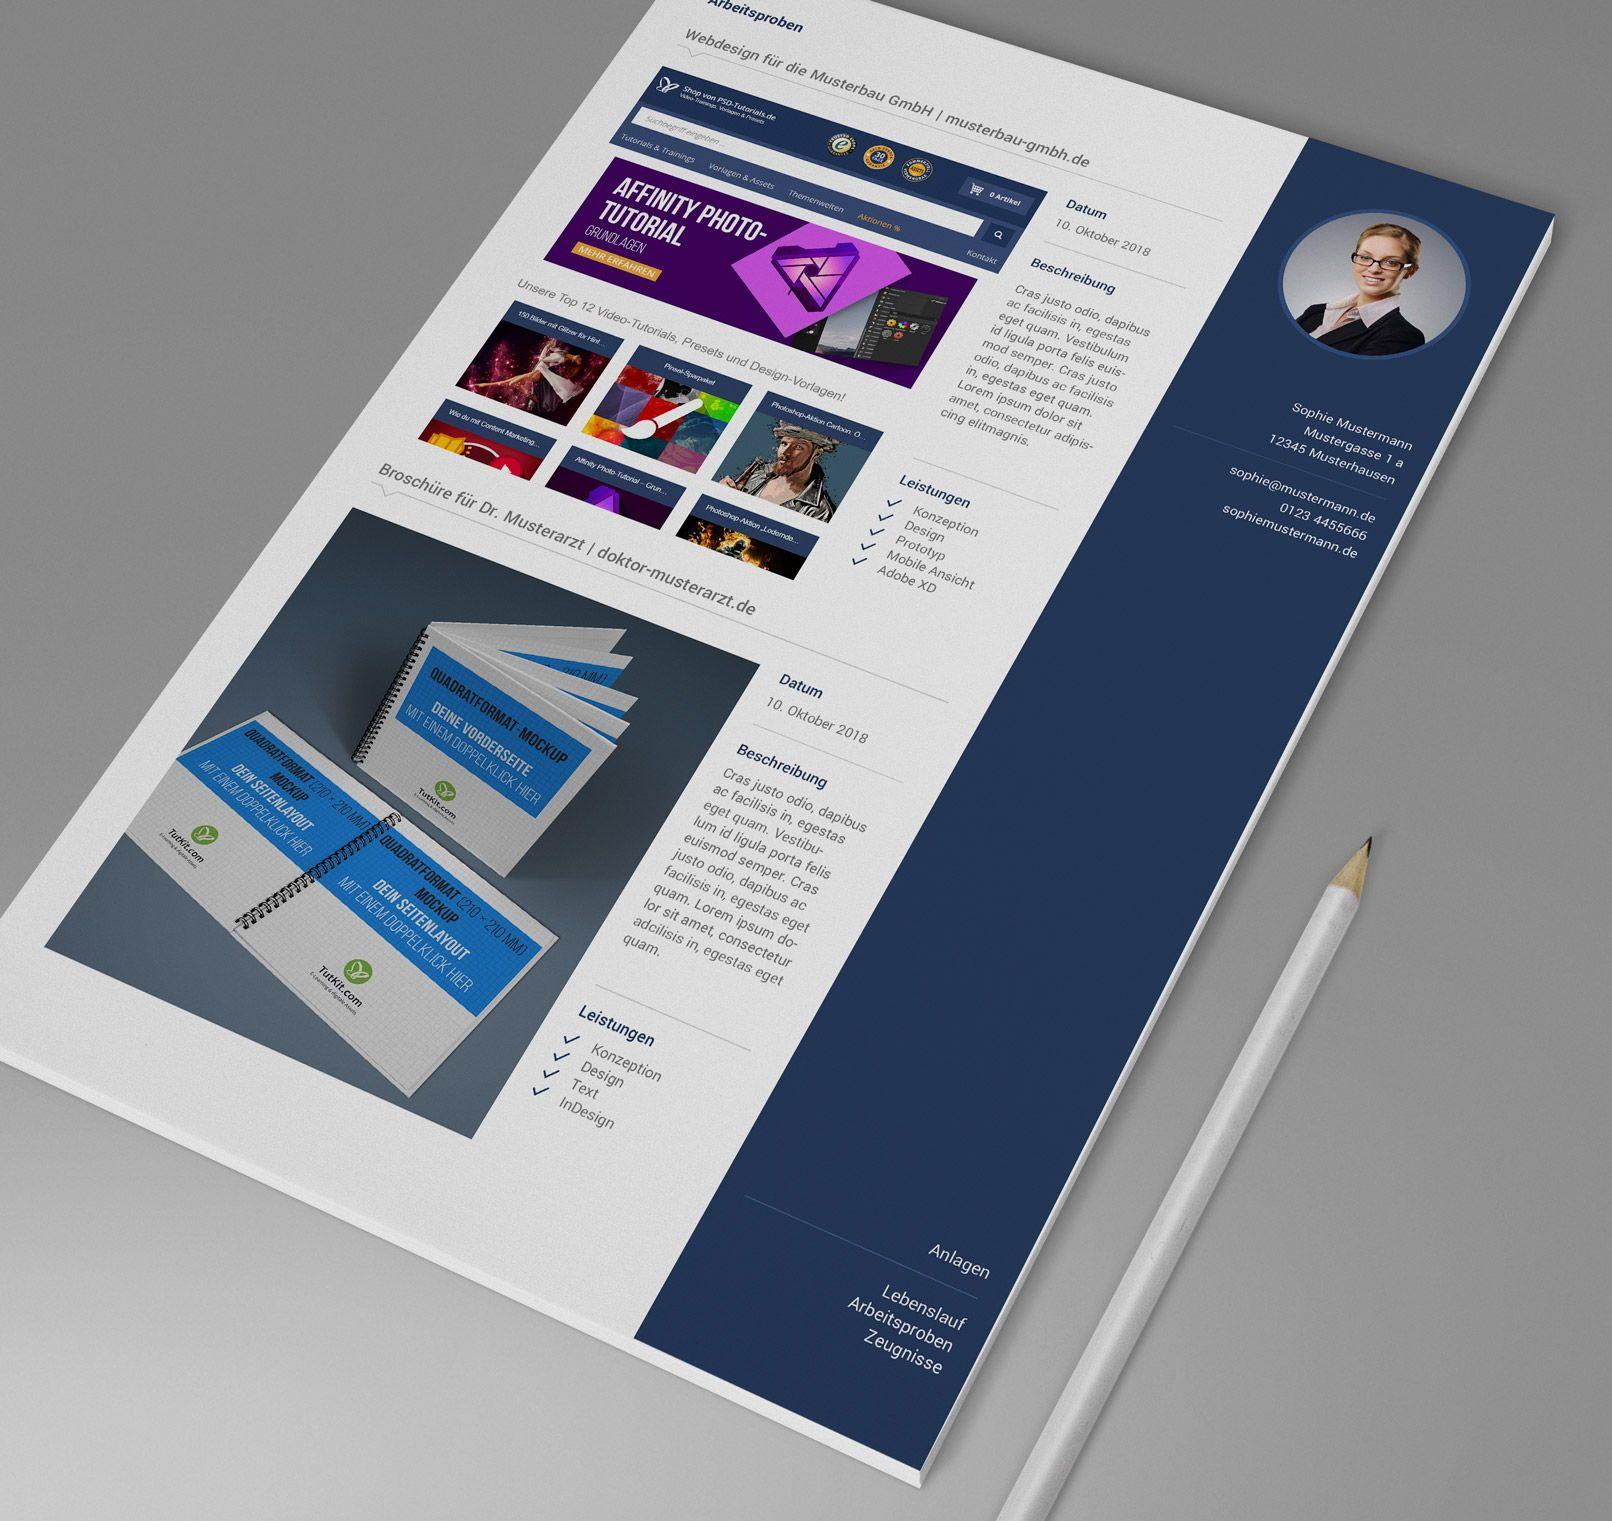 Bewerbung Mediengestalter In Kreatives Design Muster In 2020 Bewerbung Lebenslauf Mediengestalter Lebenslauf Design